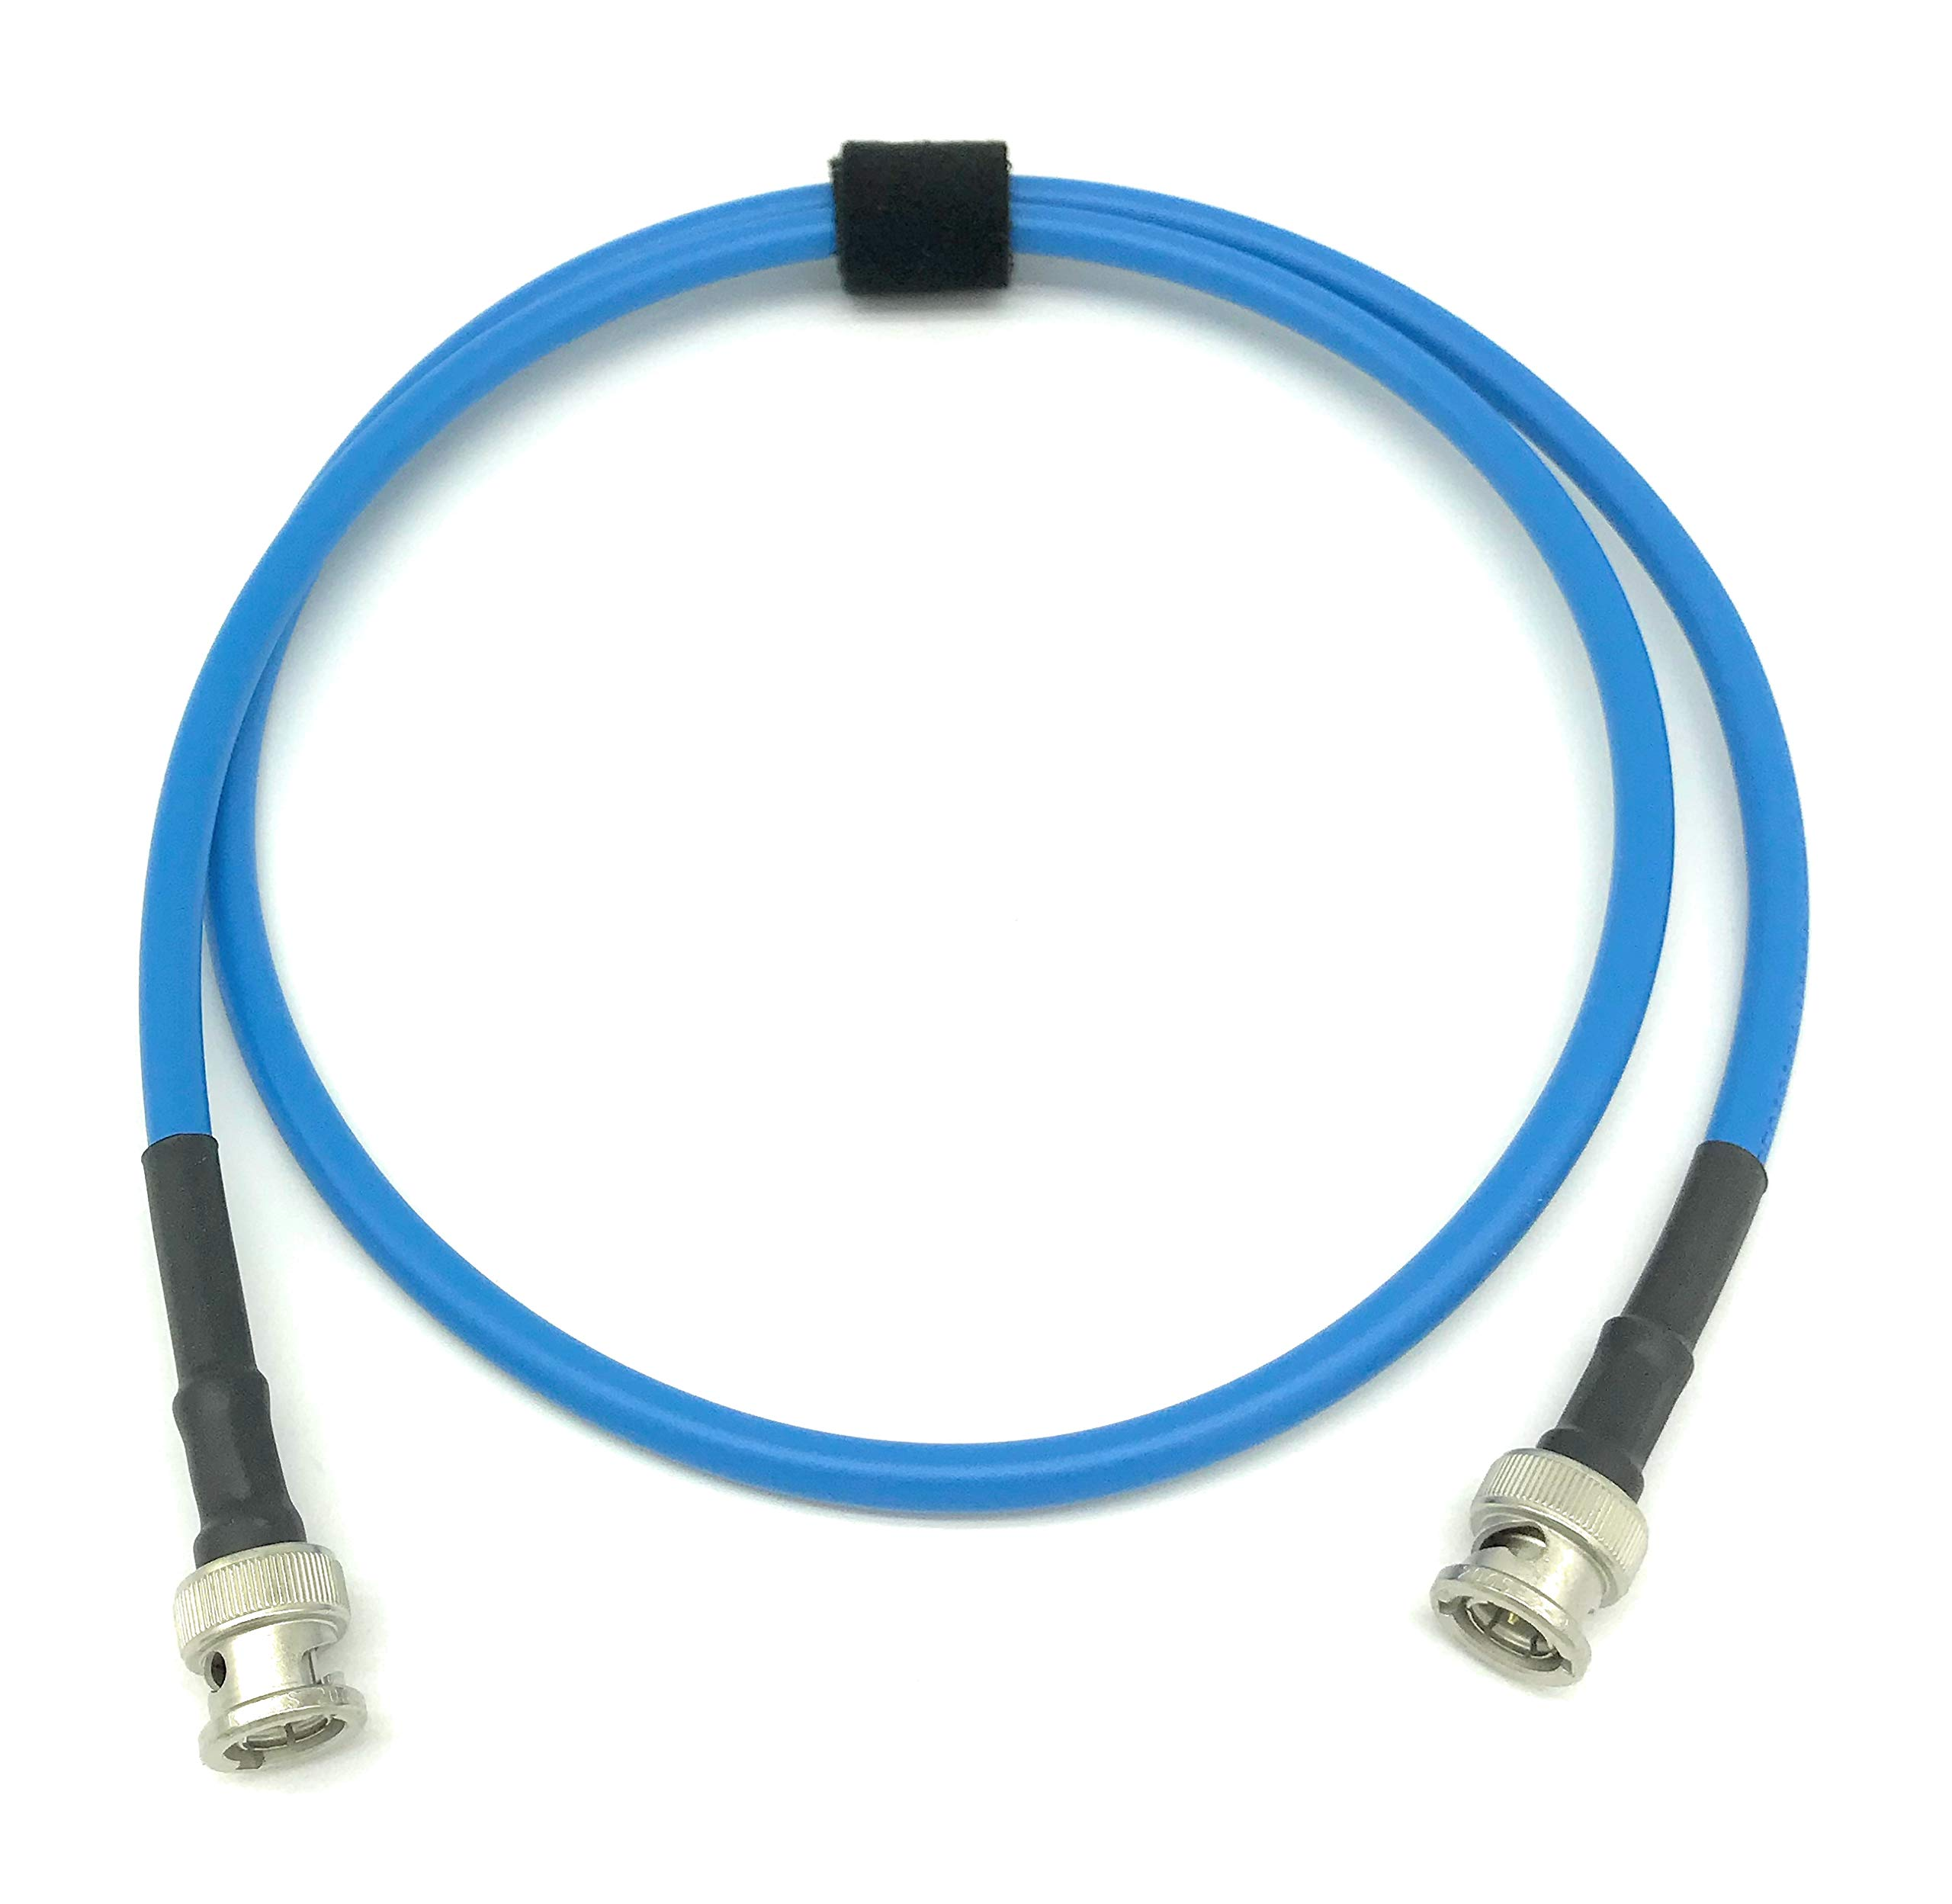 AV-Cables 3G/6G HD SDI BNC RG59 Cable Belden 1505A - Blue (100ft)